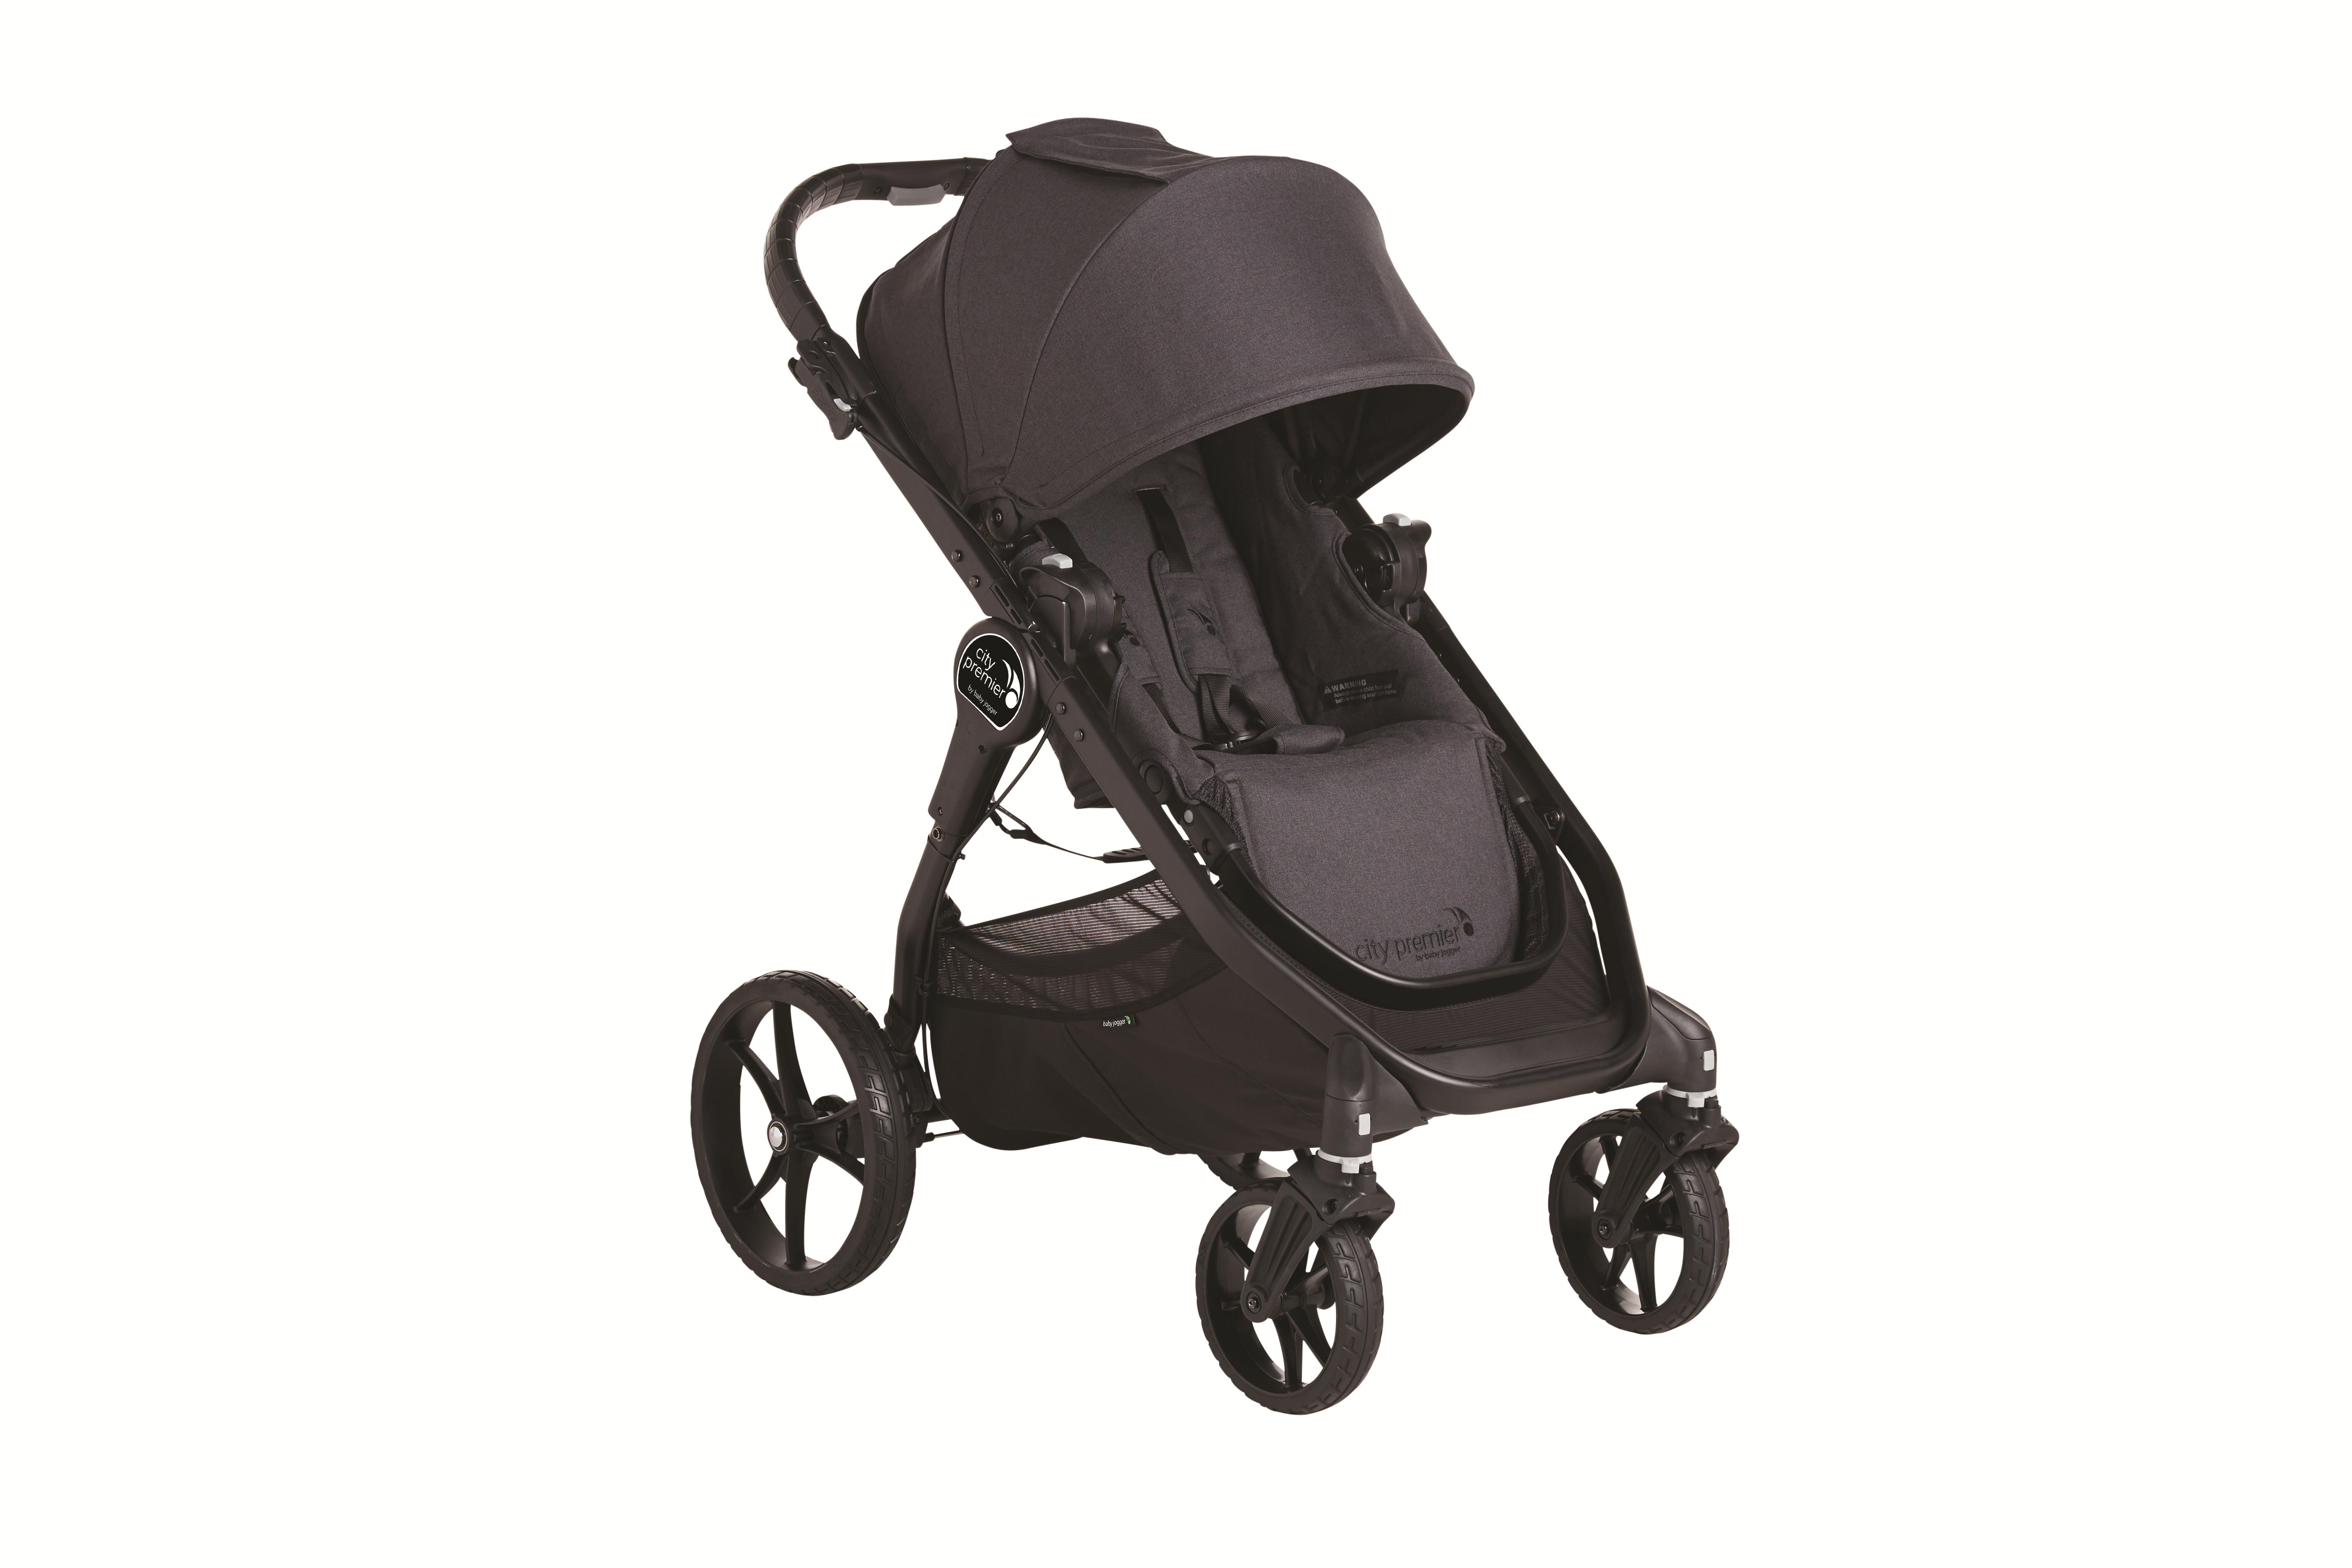 Baby jogger – Baby jogger city premier - granite, +10 stk. på lager fra pixizoo